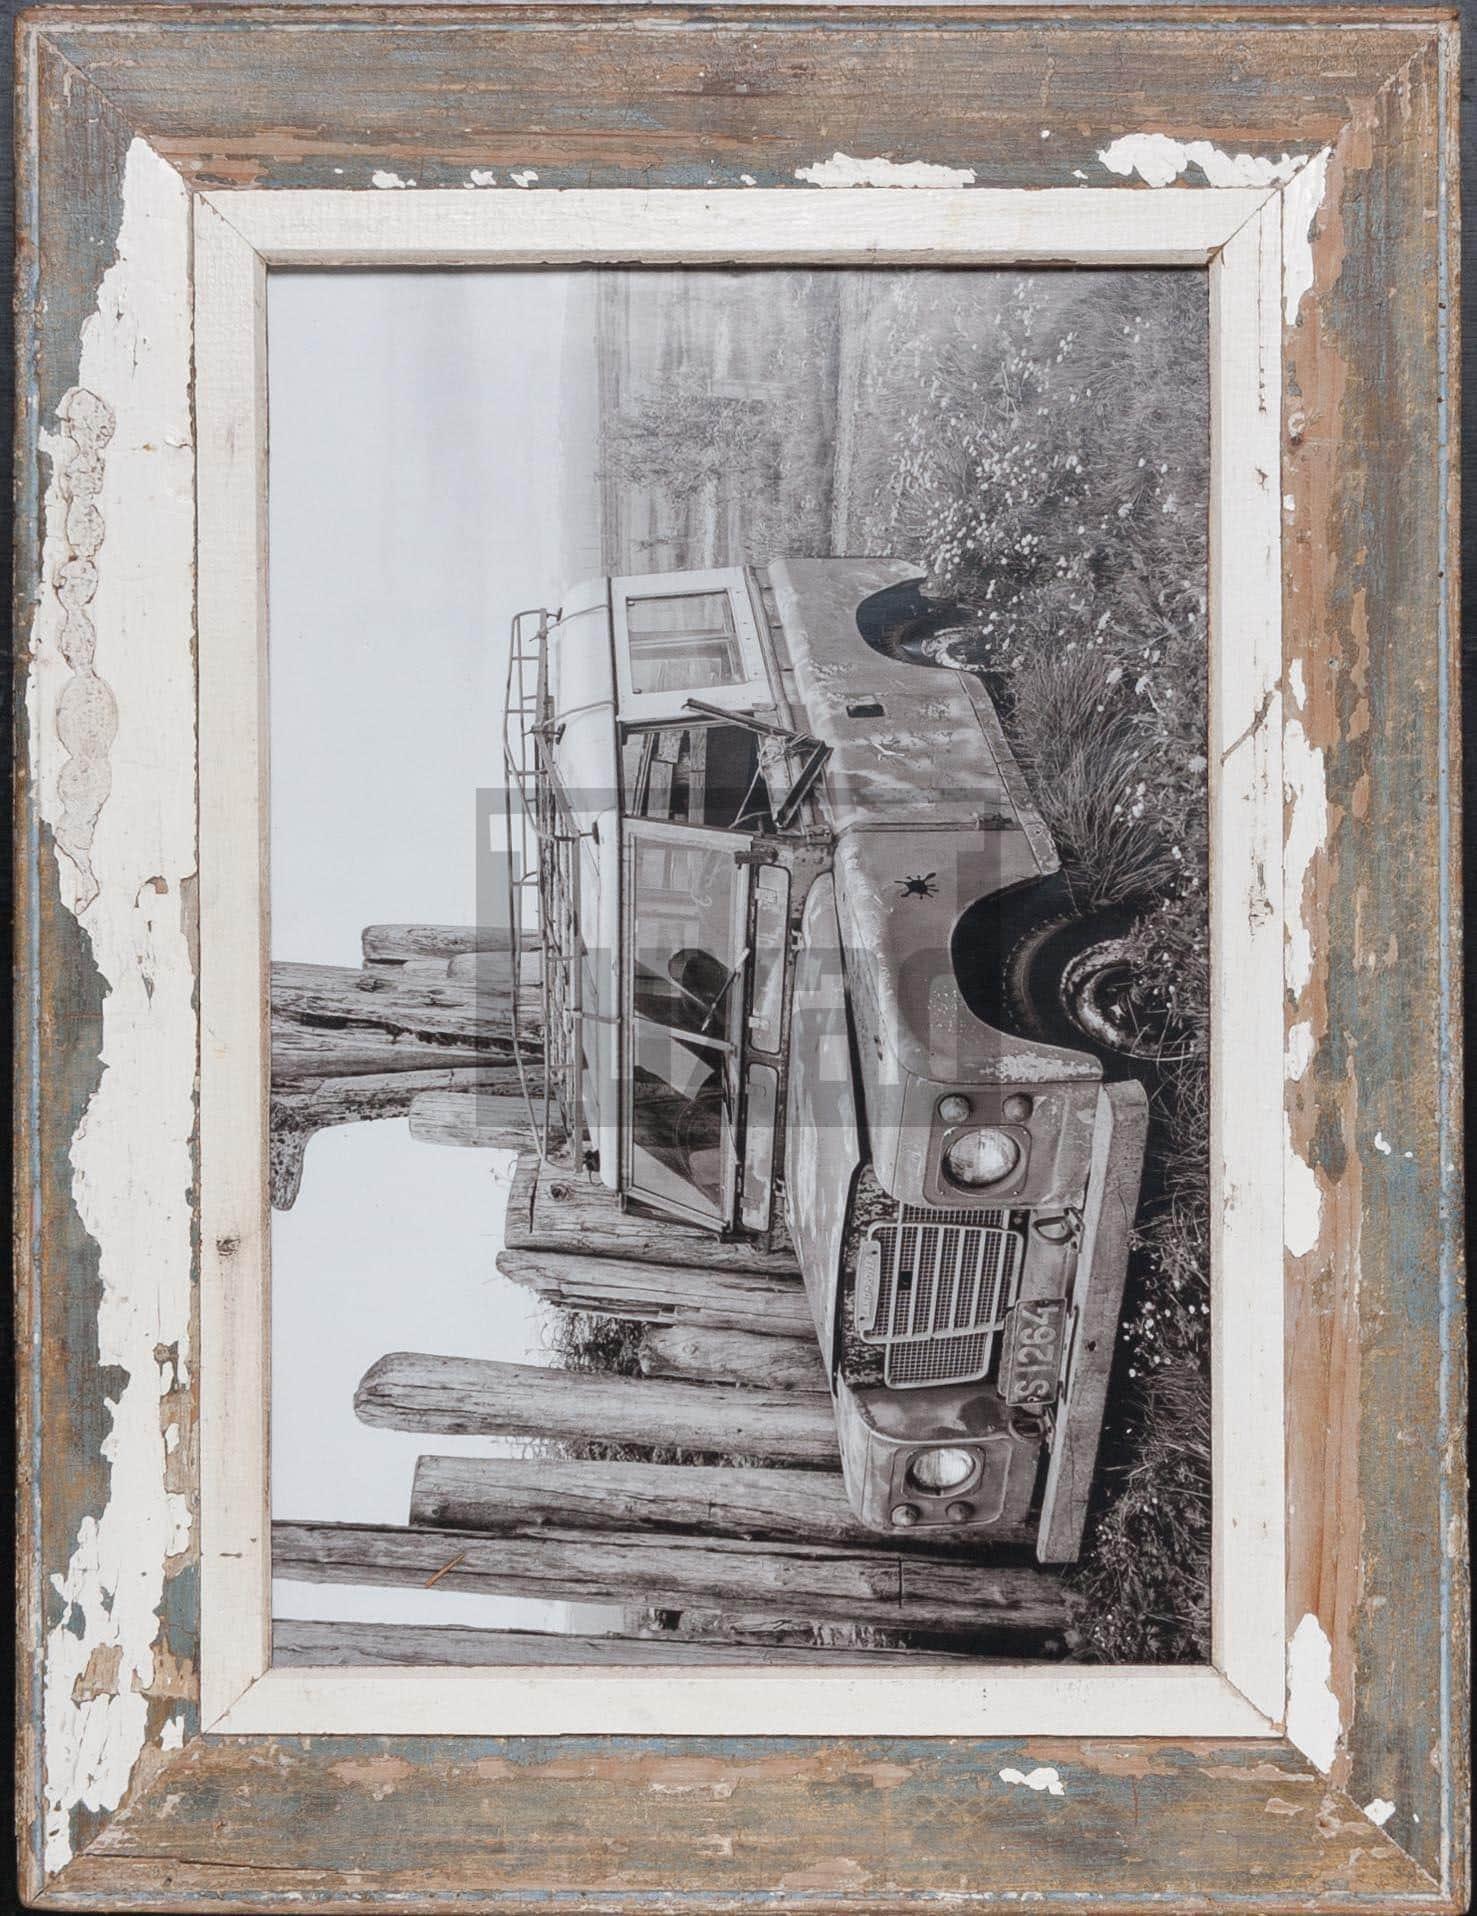 Vintage-Fotorahmen aus recyceltem Holz für Fotos DIN A3